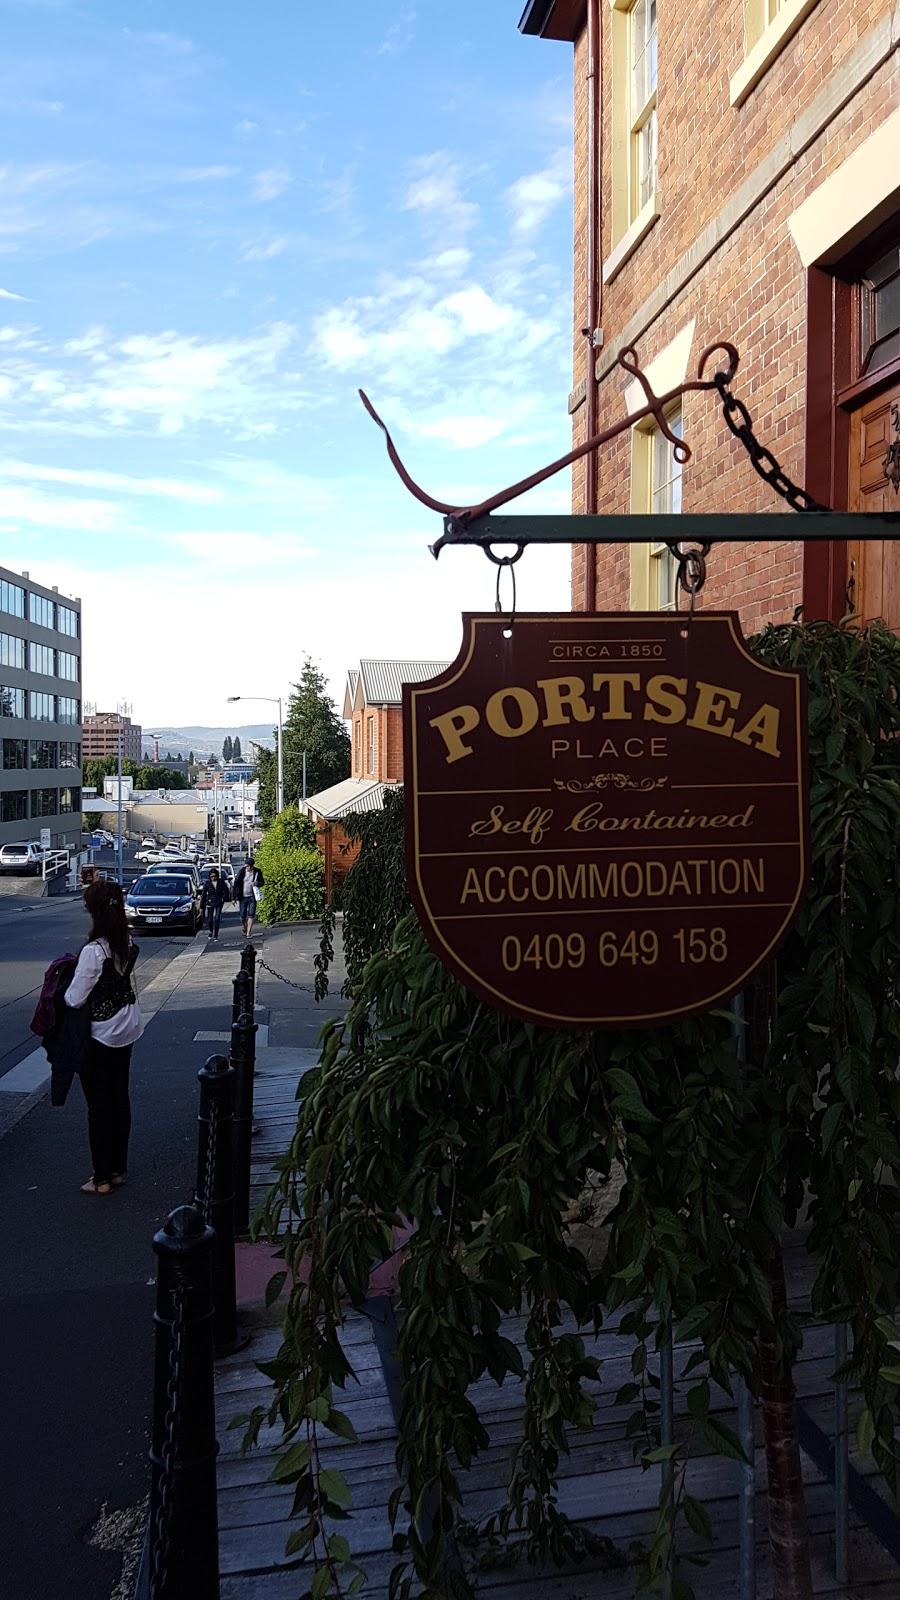 Apartments Portsea Place   lodging   62 Montpelier Retreat, Battery Point TAS 7004, Australia